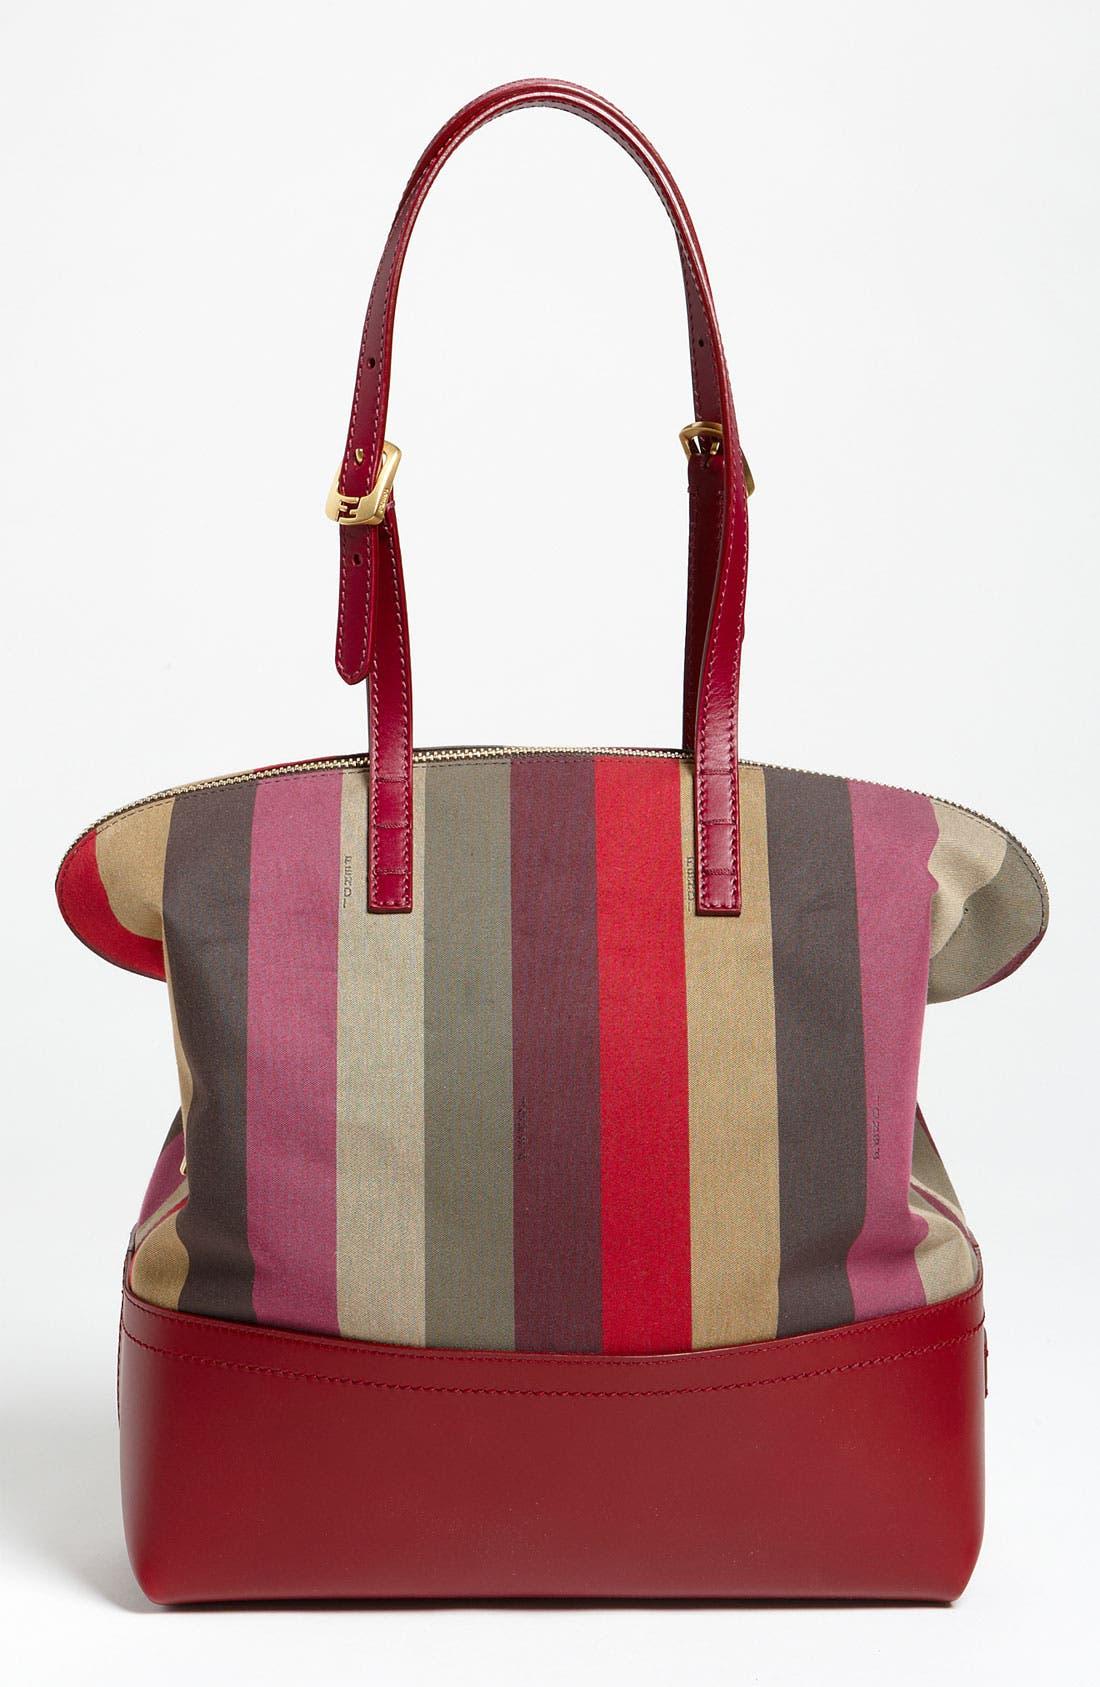 Main Image - Fendi 'Pequin 2-Way' Shopper